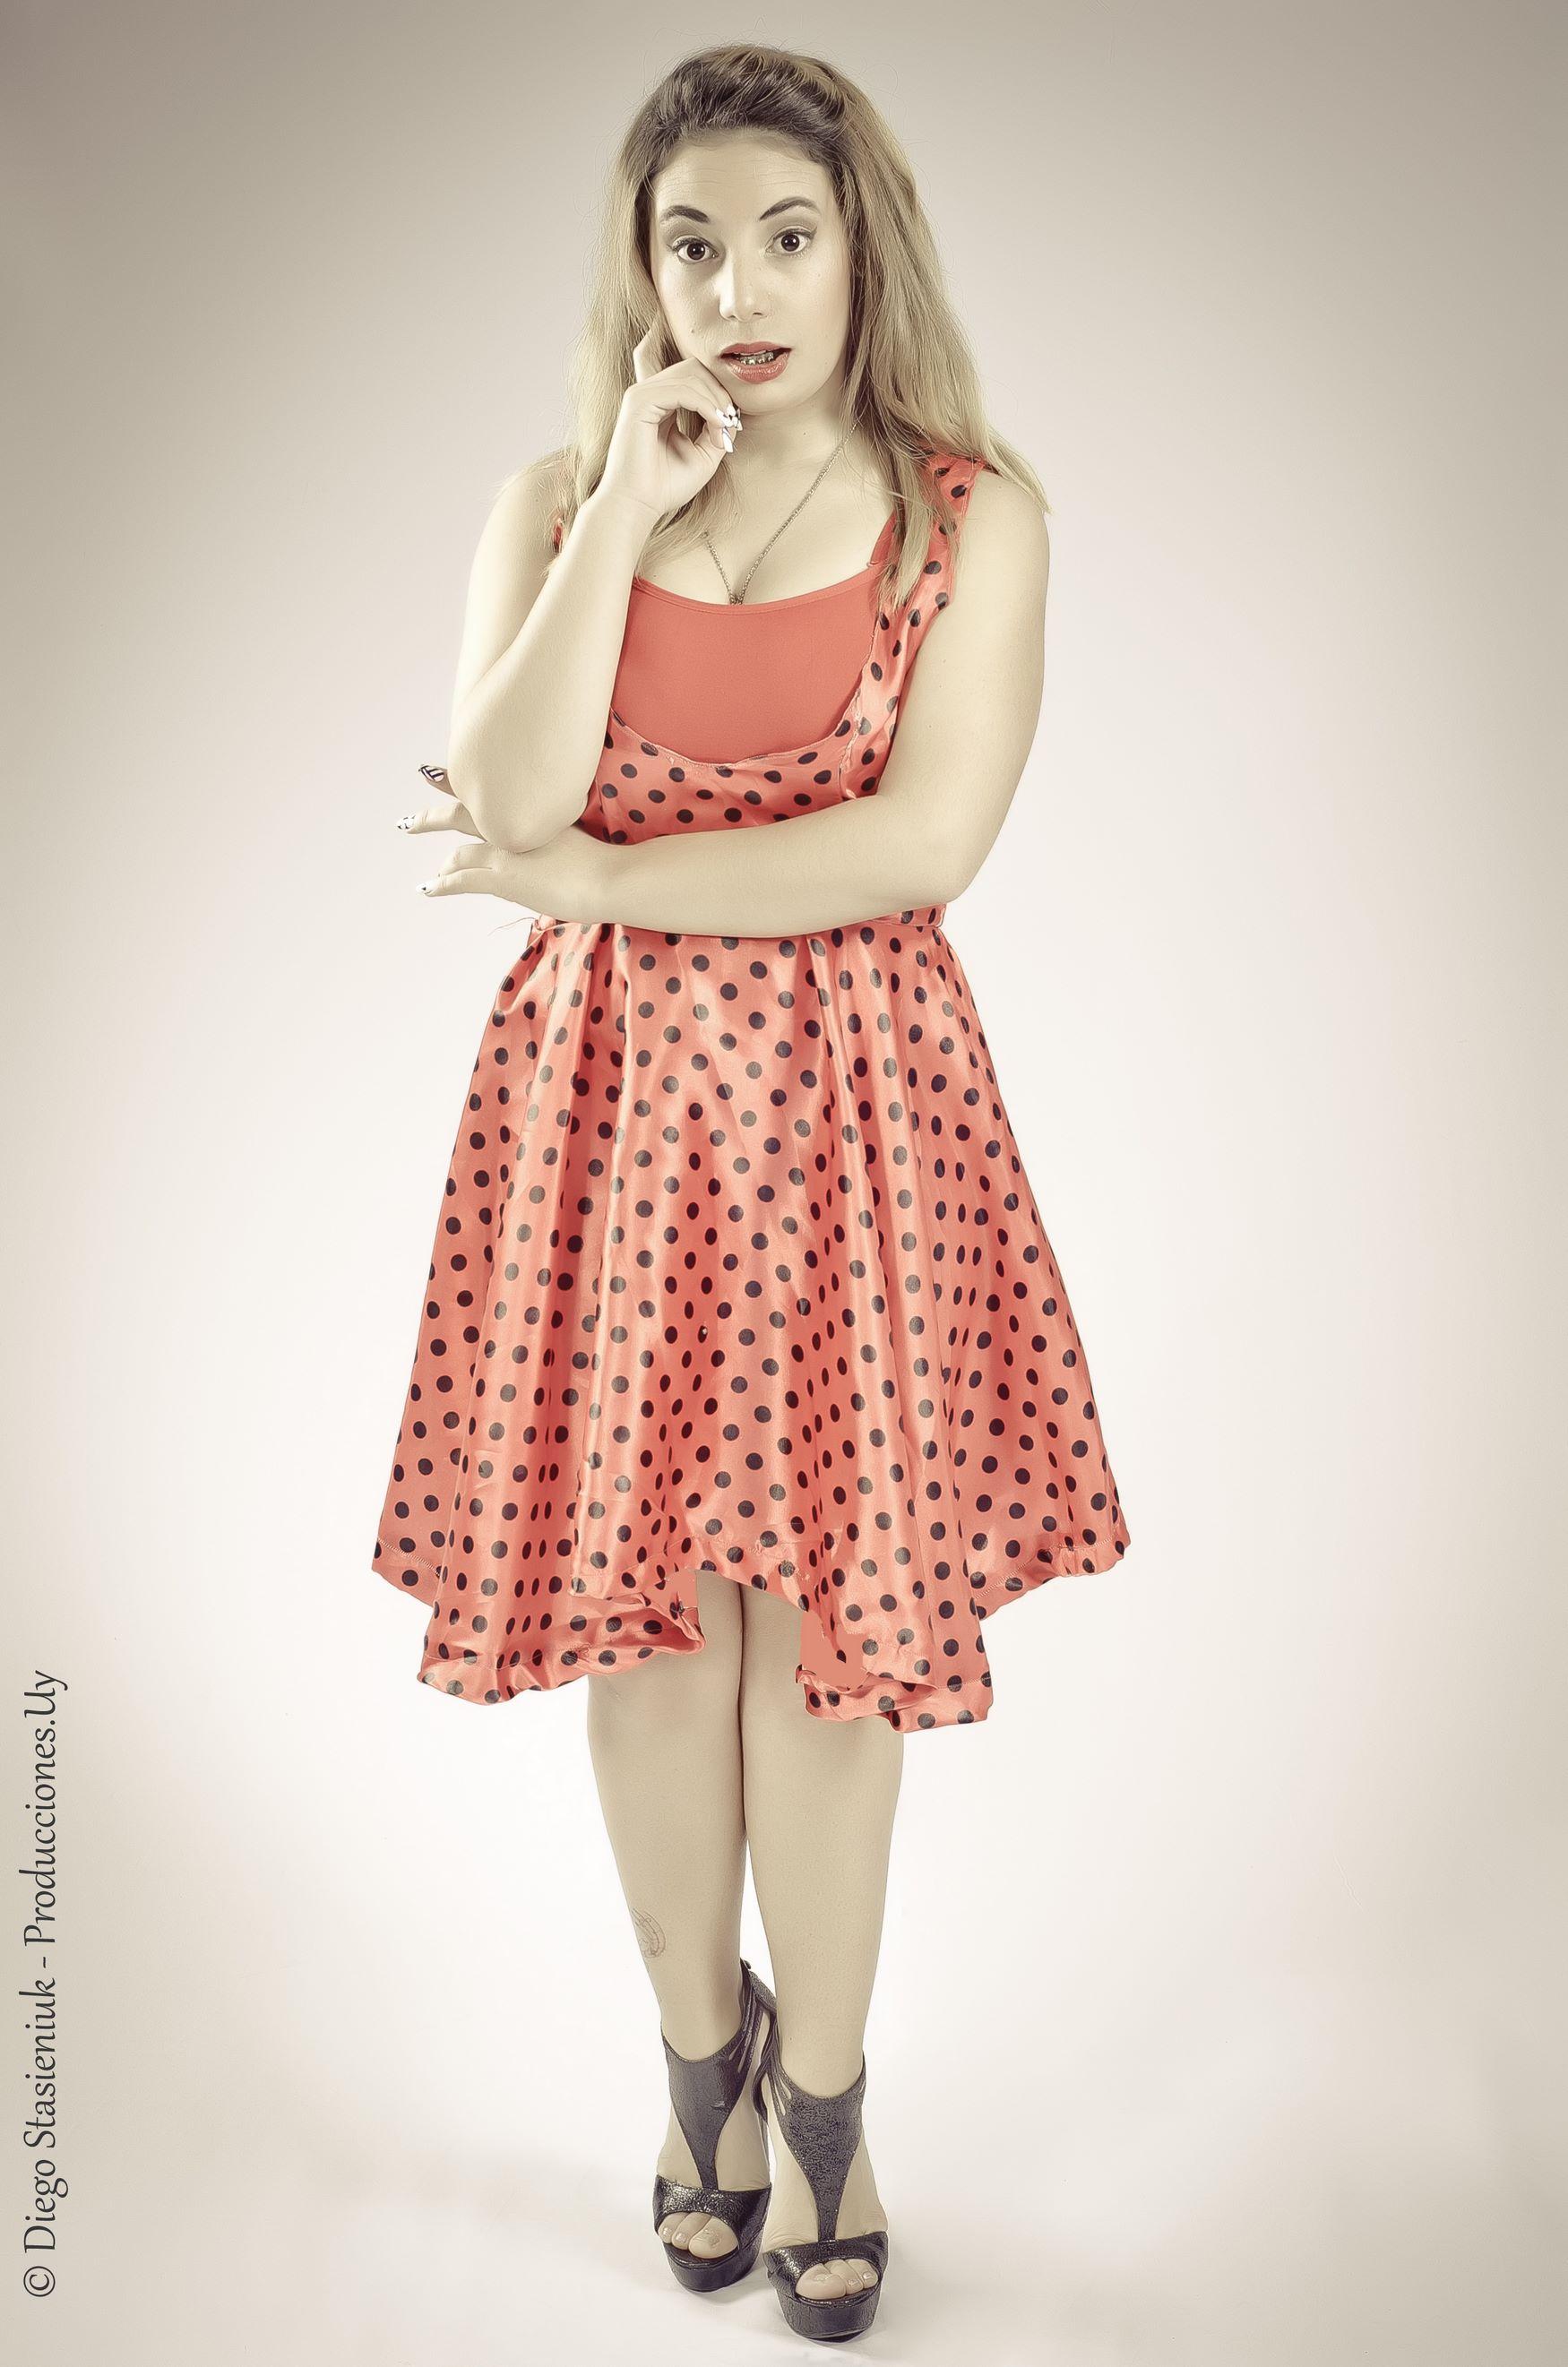 A Pinup Girl #12